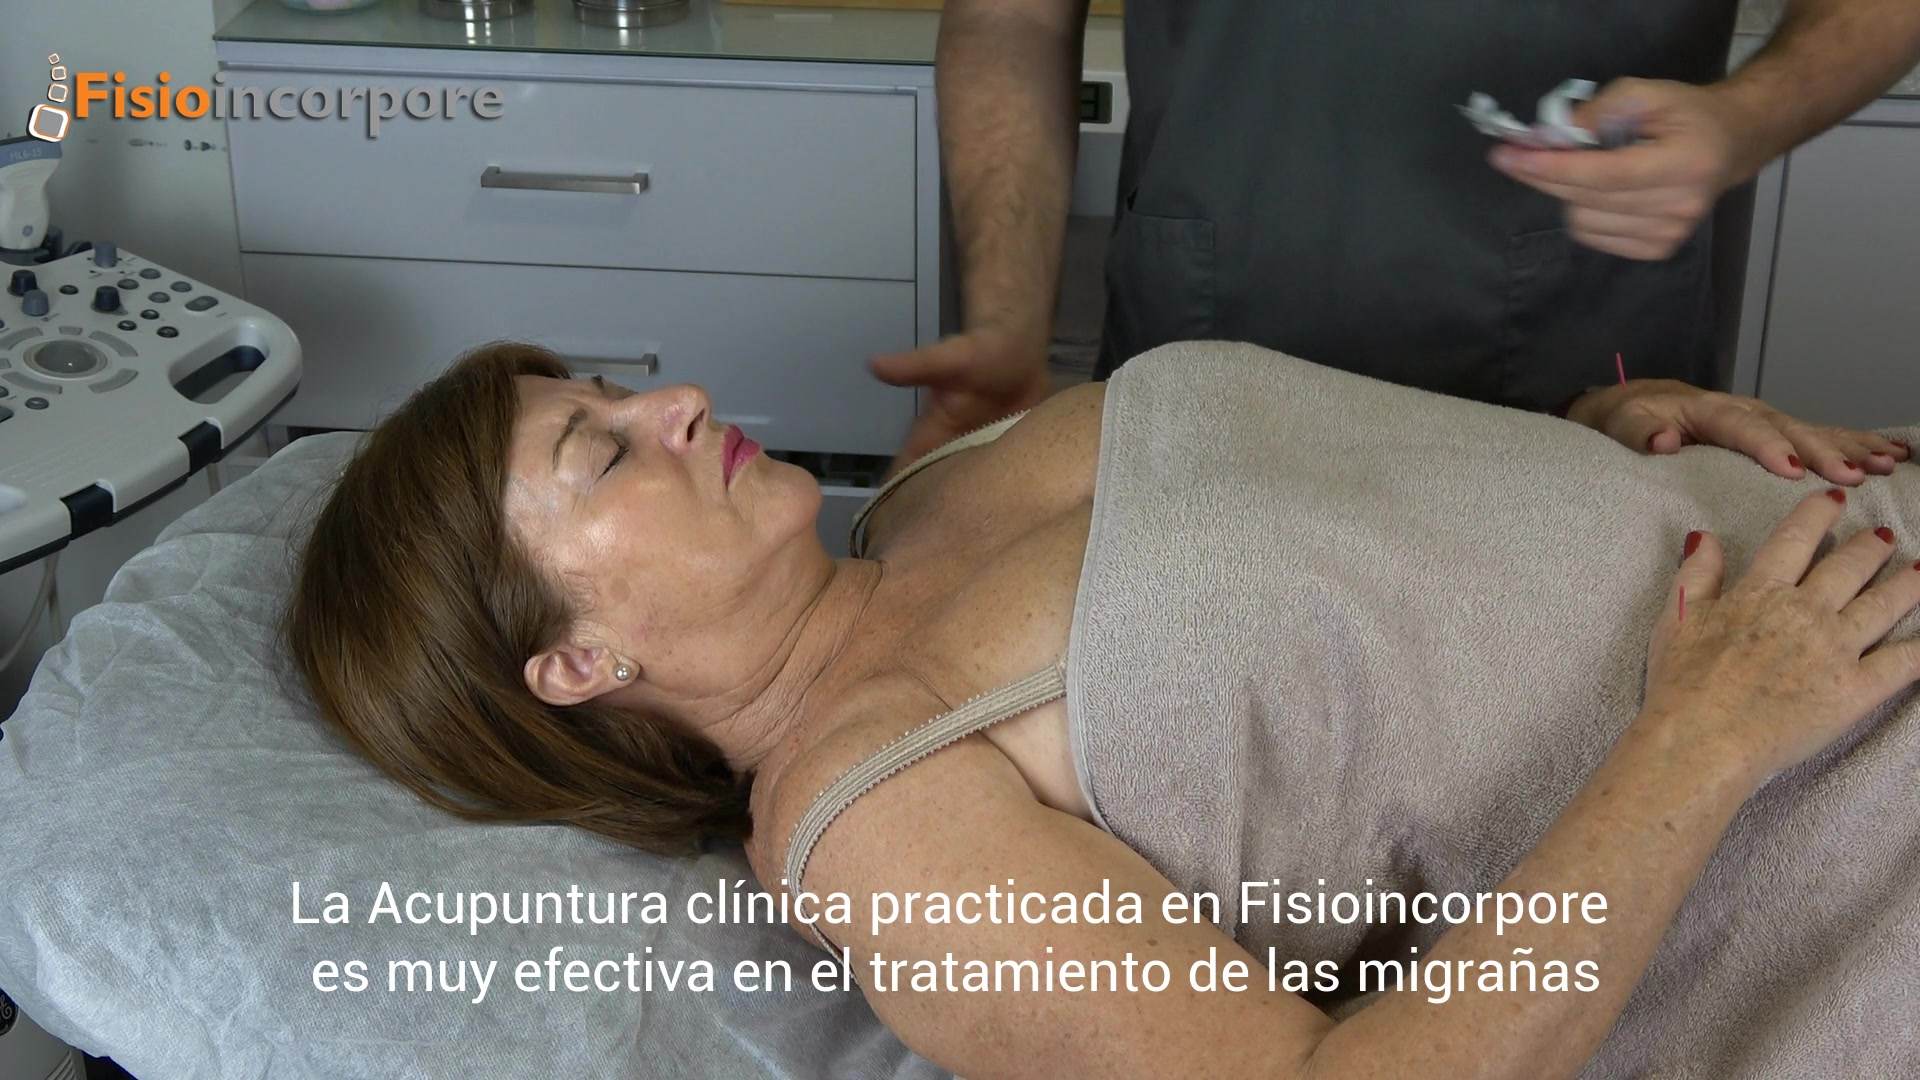 Fisioincorpore_acupuntura_migrañas